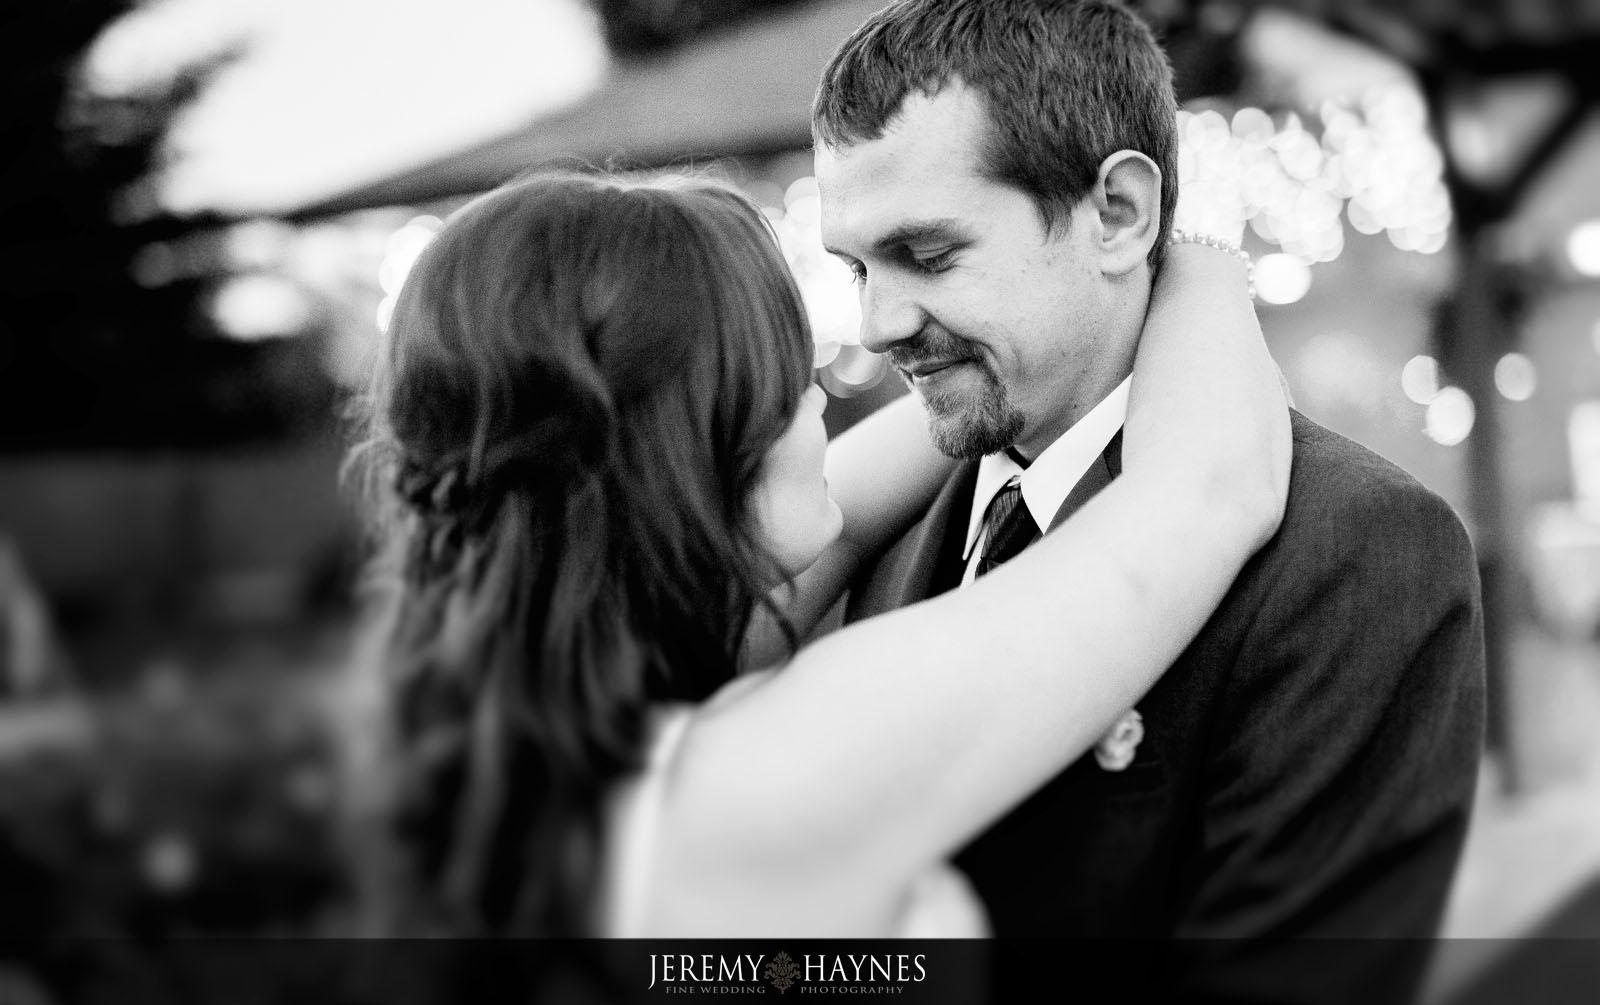 jeremy-haynes-photography-indianapolis-wedding-photographers-wedding-couple-first-dance.jpg